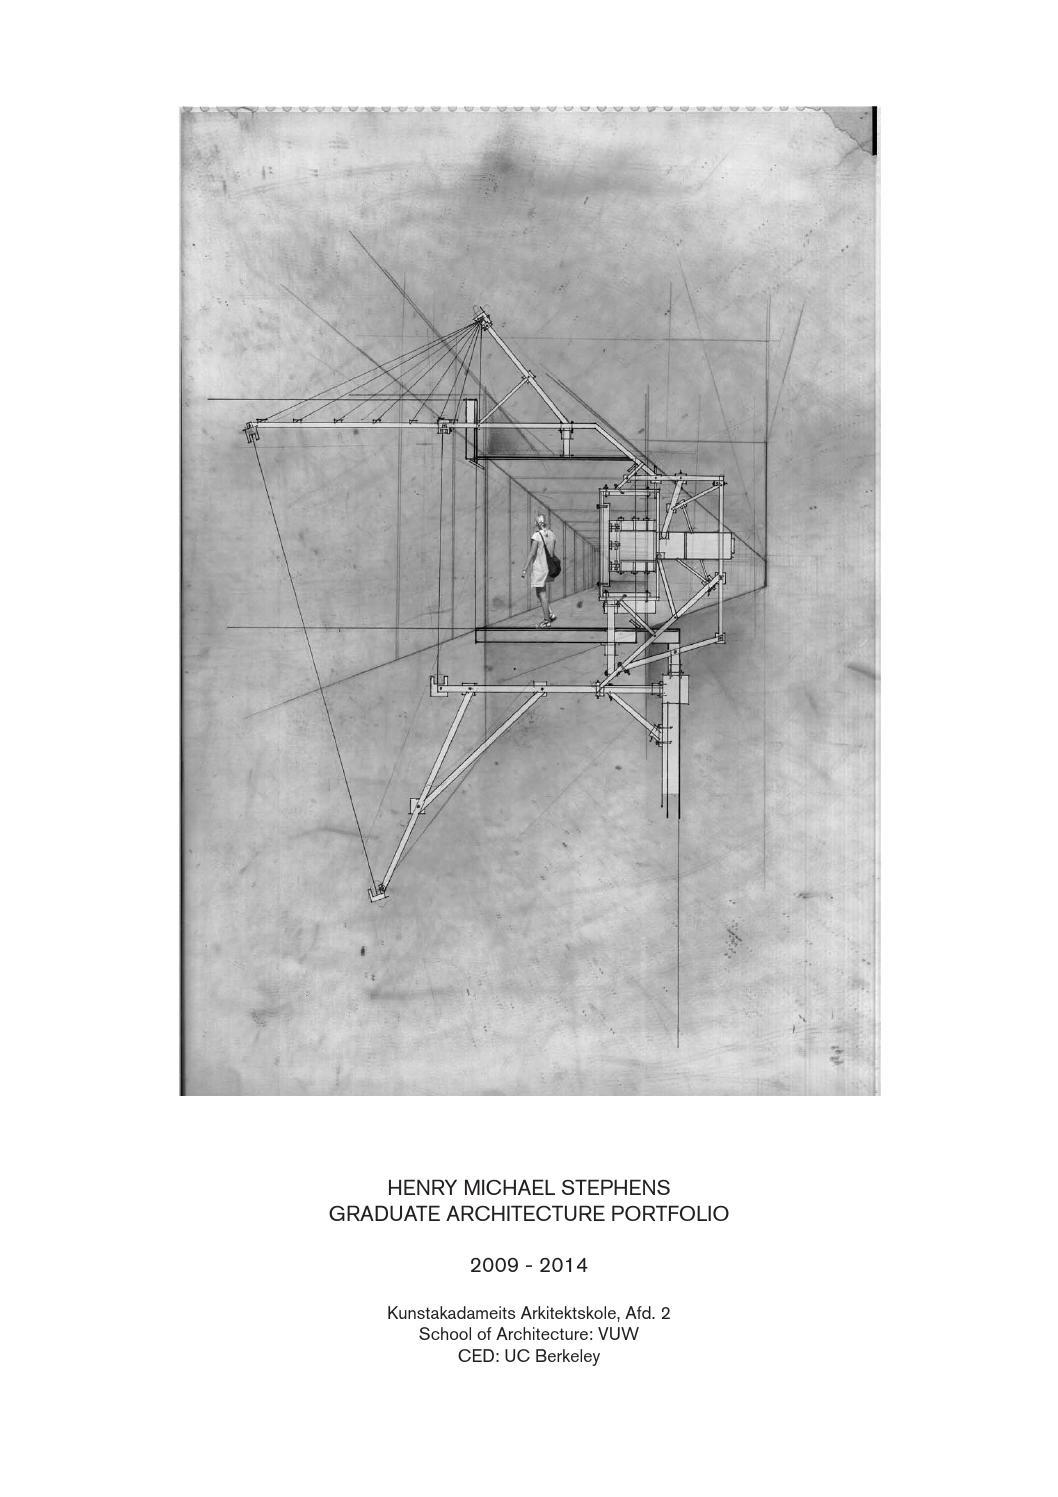 henry stephens   graduate architecture portfoliohenry stephens